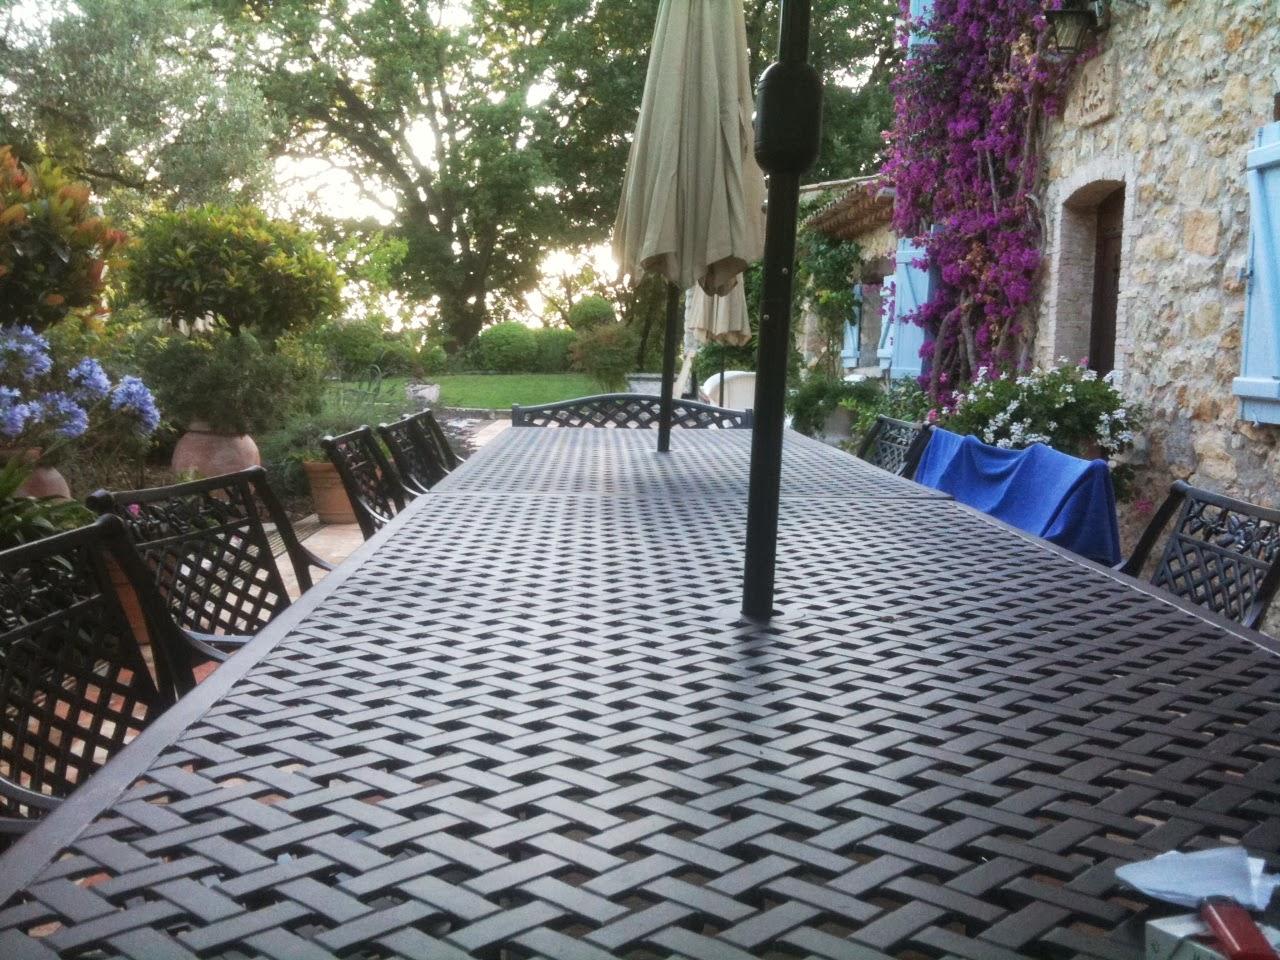 Cherche salon de jardin grande taille le blog de lazy susan - Cherche salon de jardin ...